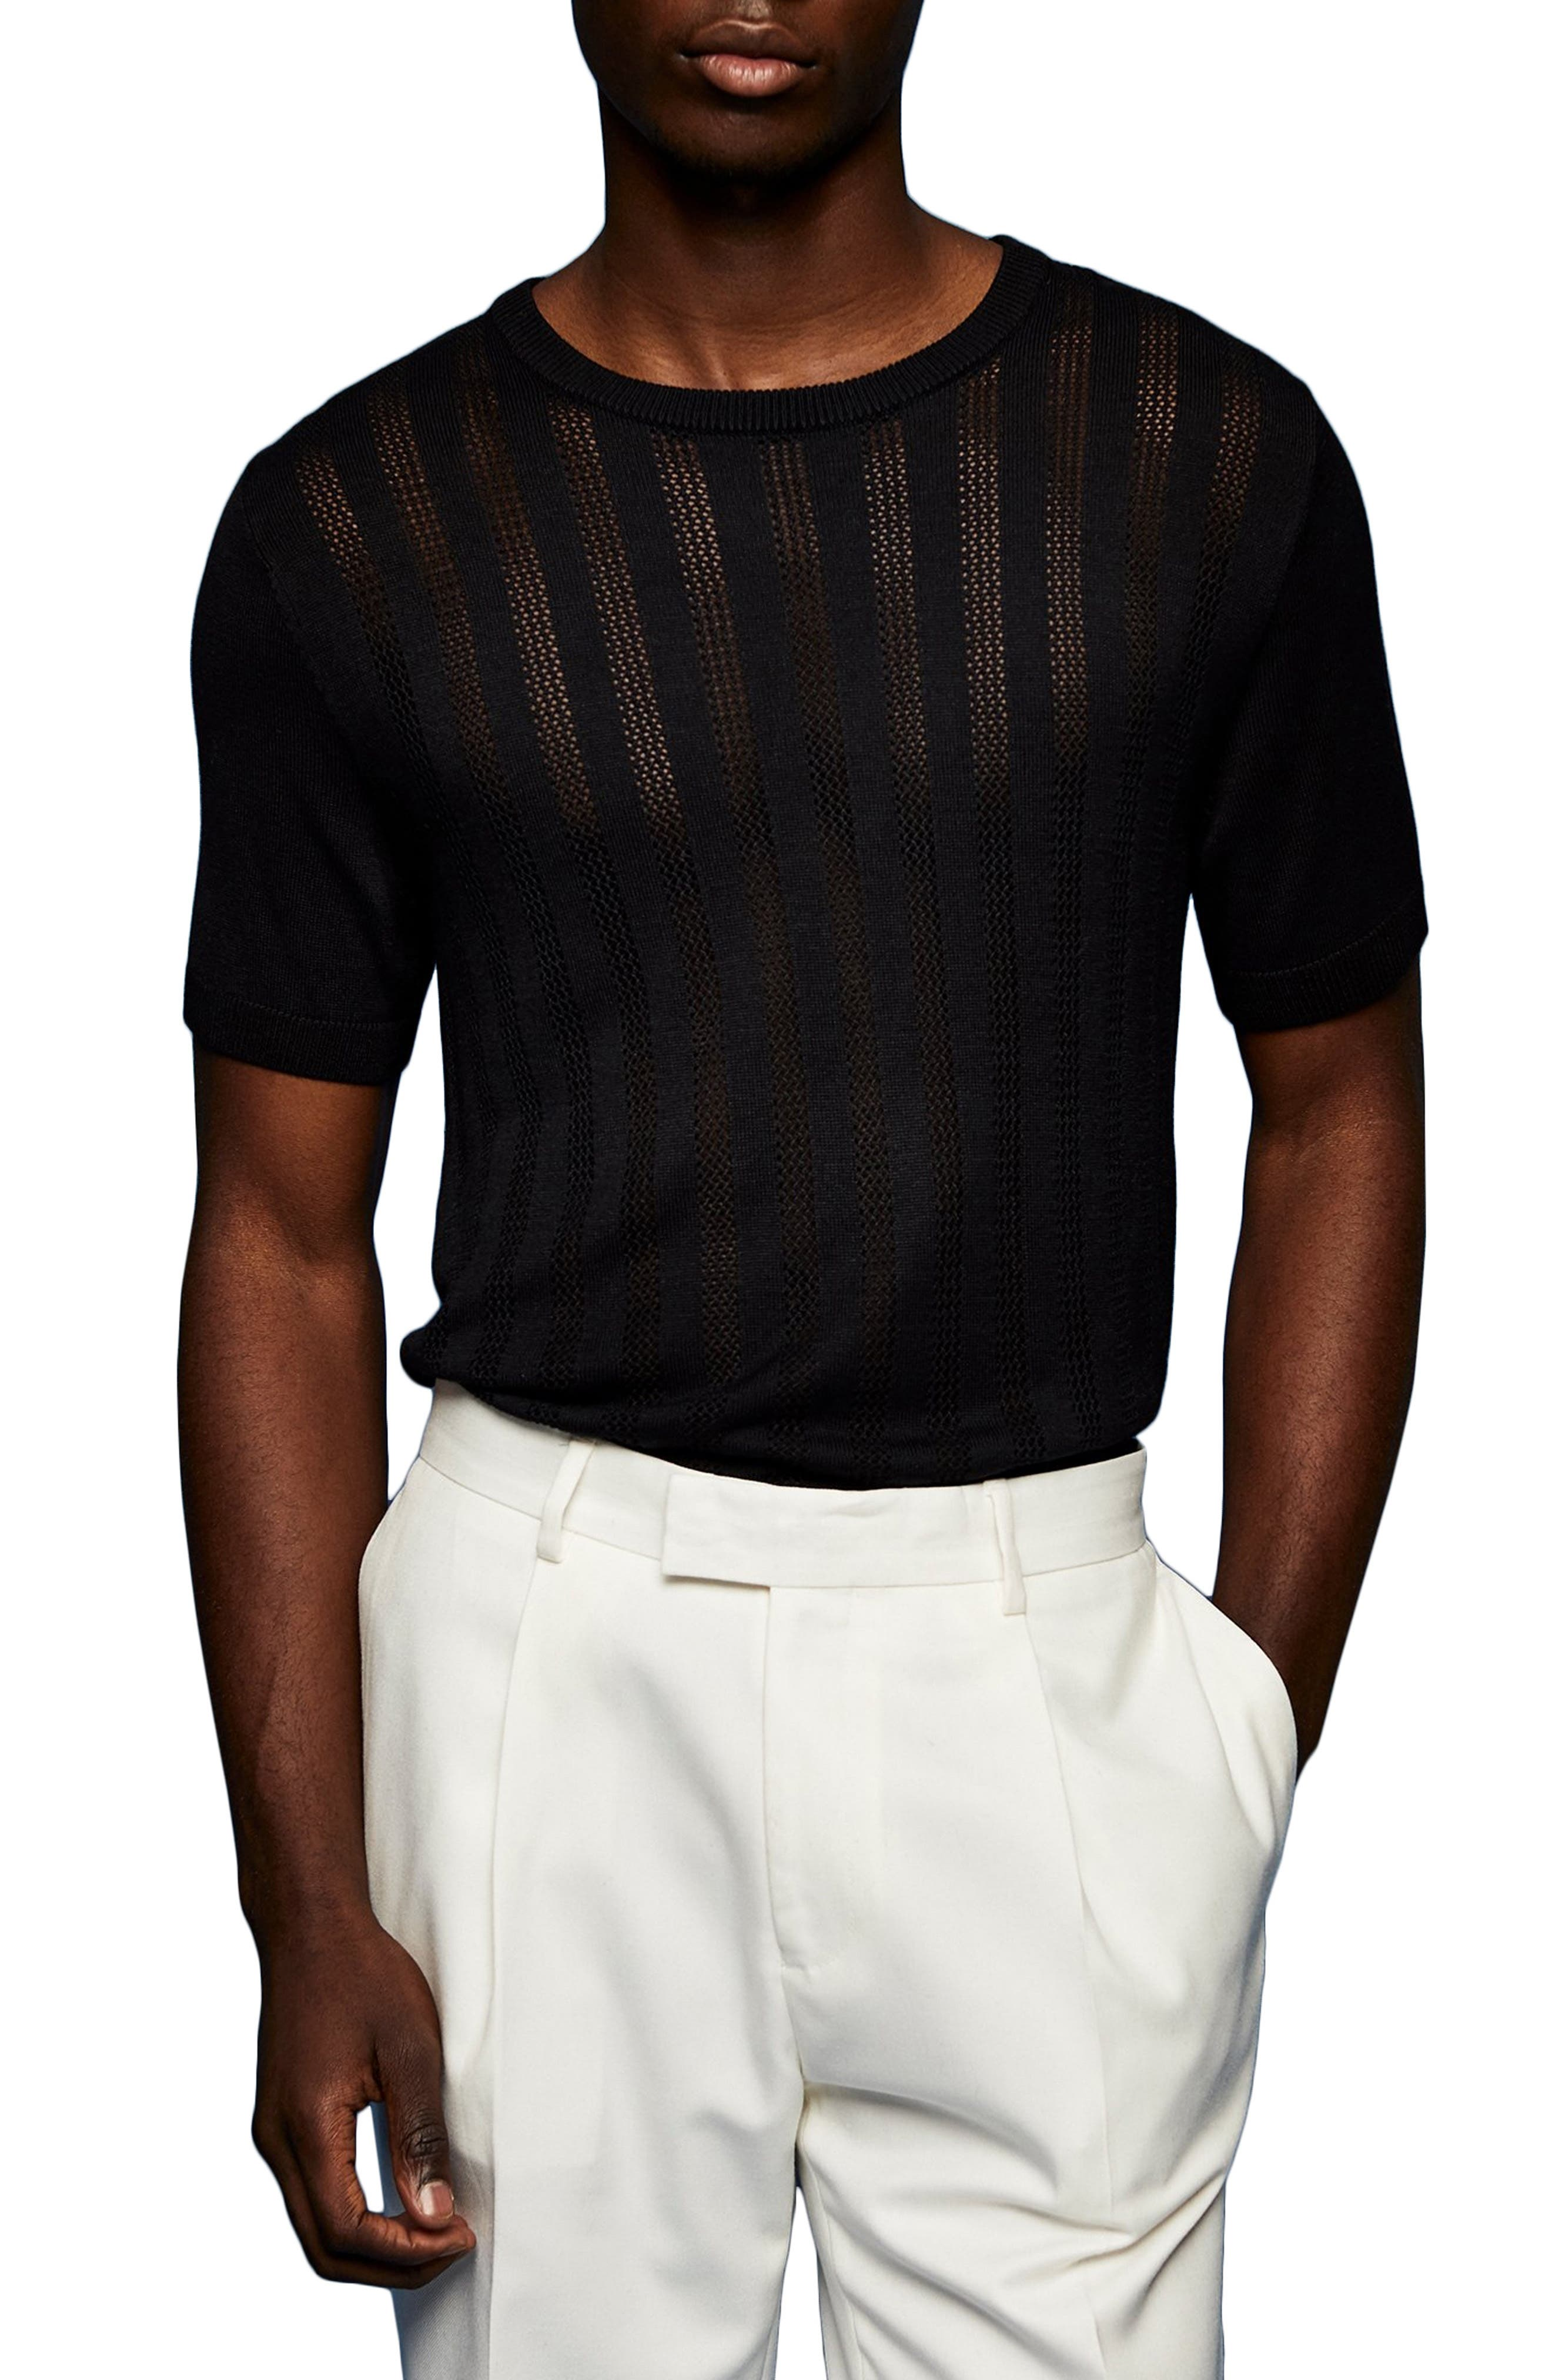 80s Men's Clothing | Shirts, Jeans, Jackets for Guys Mens Topman Slim Fit Mesh Effect Sweater Knit T-Shirt Size Large - Black $50.00 AT vintagedancer.com